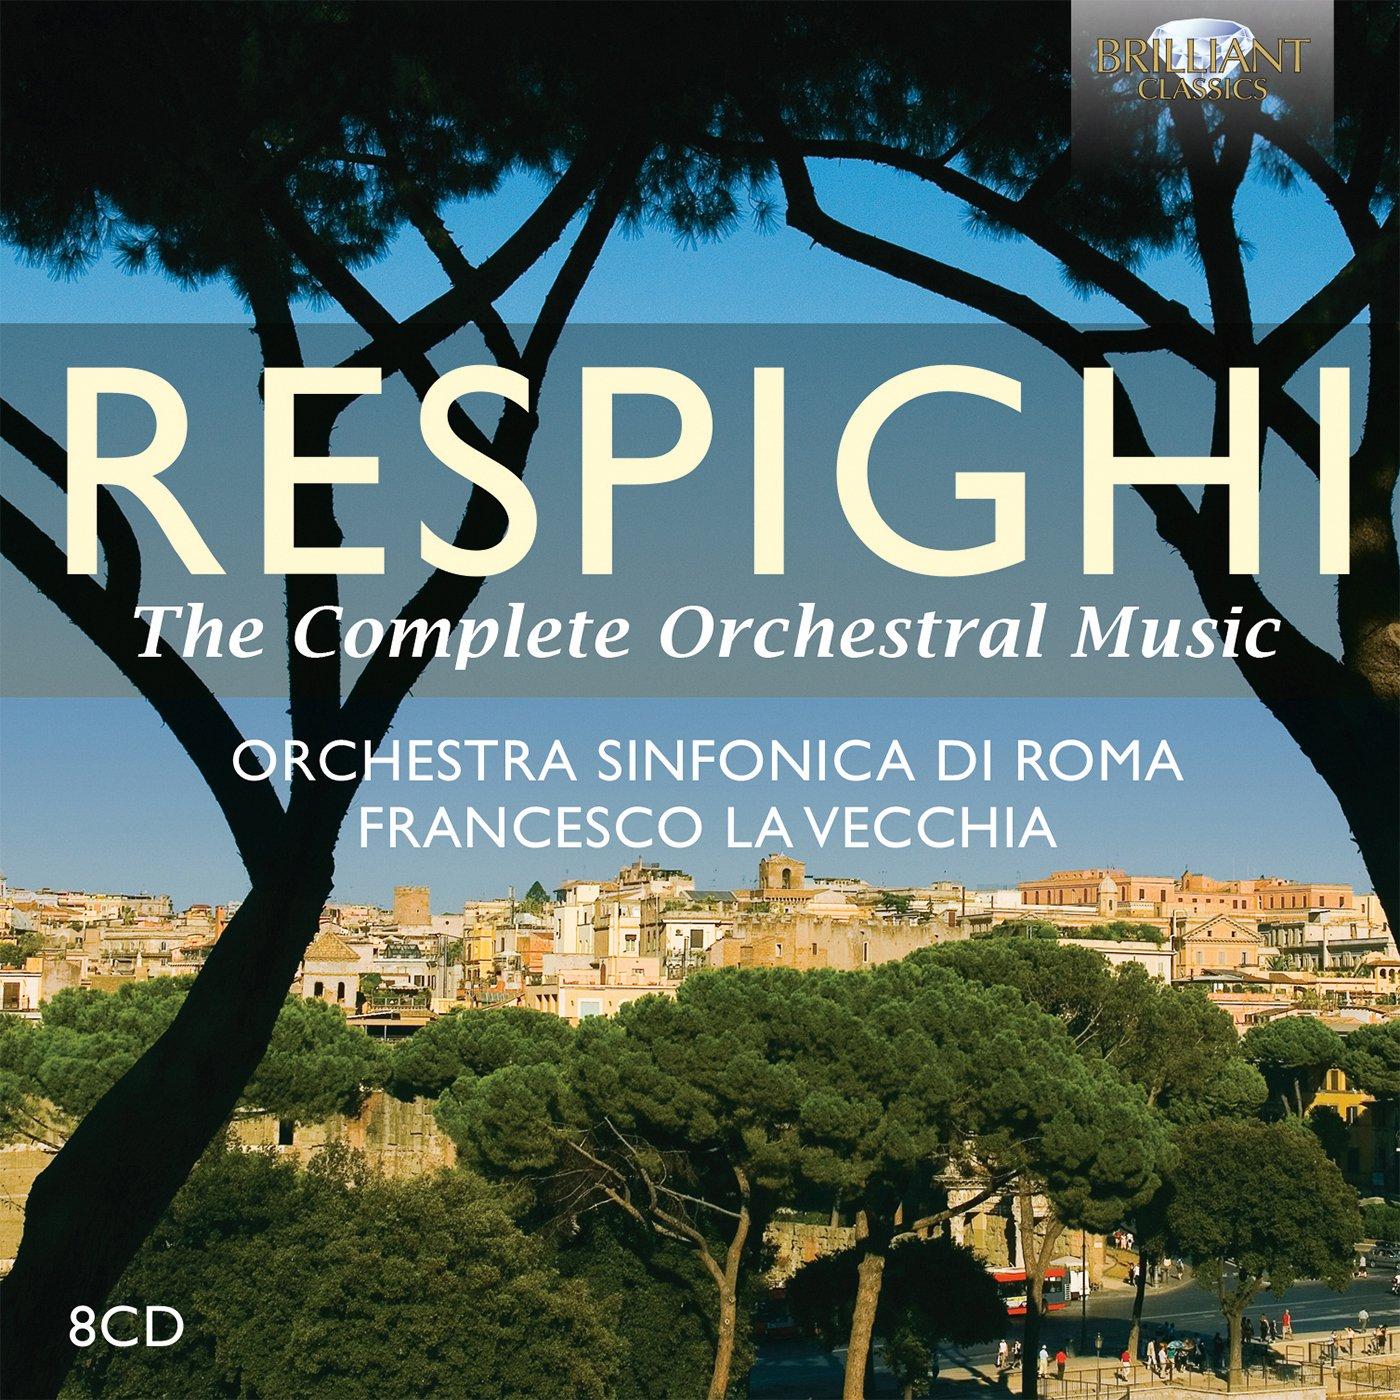 Respighi: Complete Orchestral Music [Box Set] by Brilliant Classics